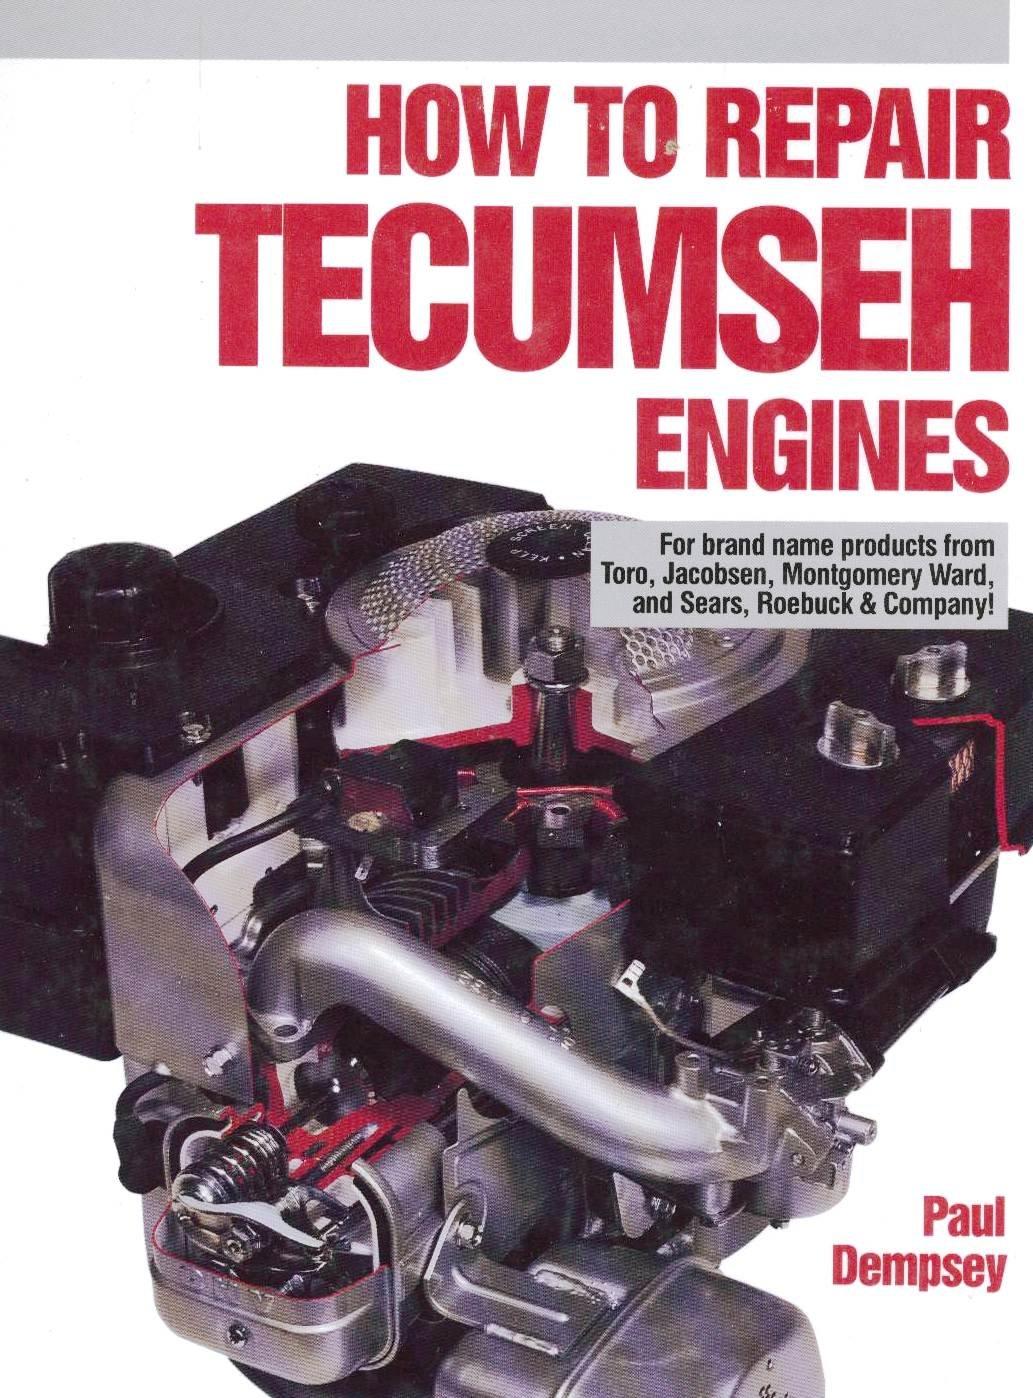 how to repair tecumseh engines paul dempsey 9780830683574 amazon rh amazon com Tecumseh Engine Identification Chart 8 HP Tecumseh Engine Manual